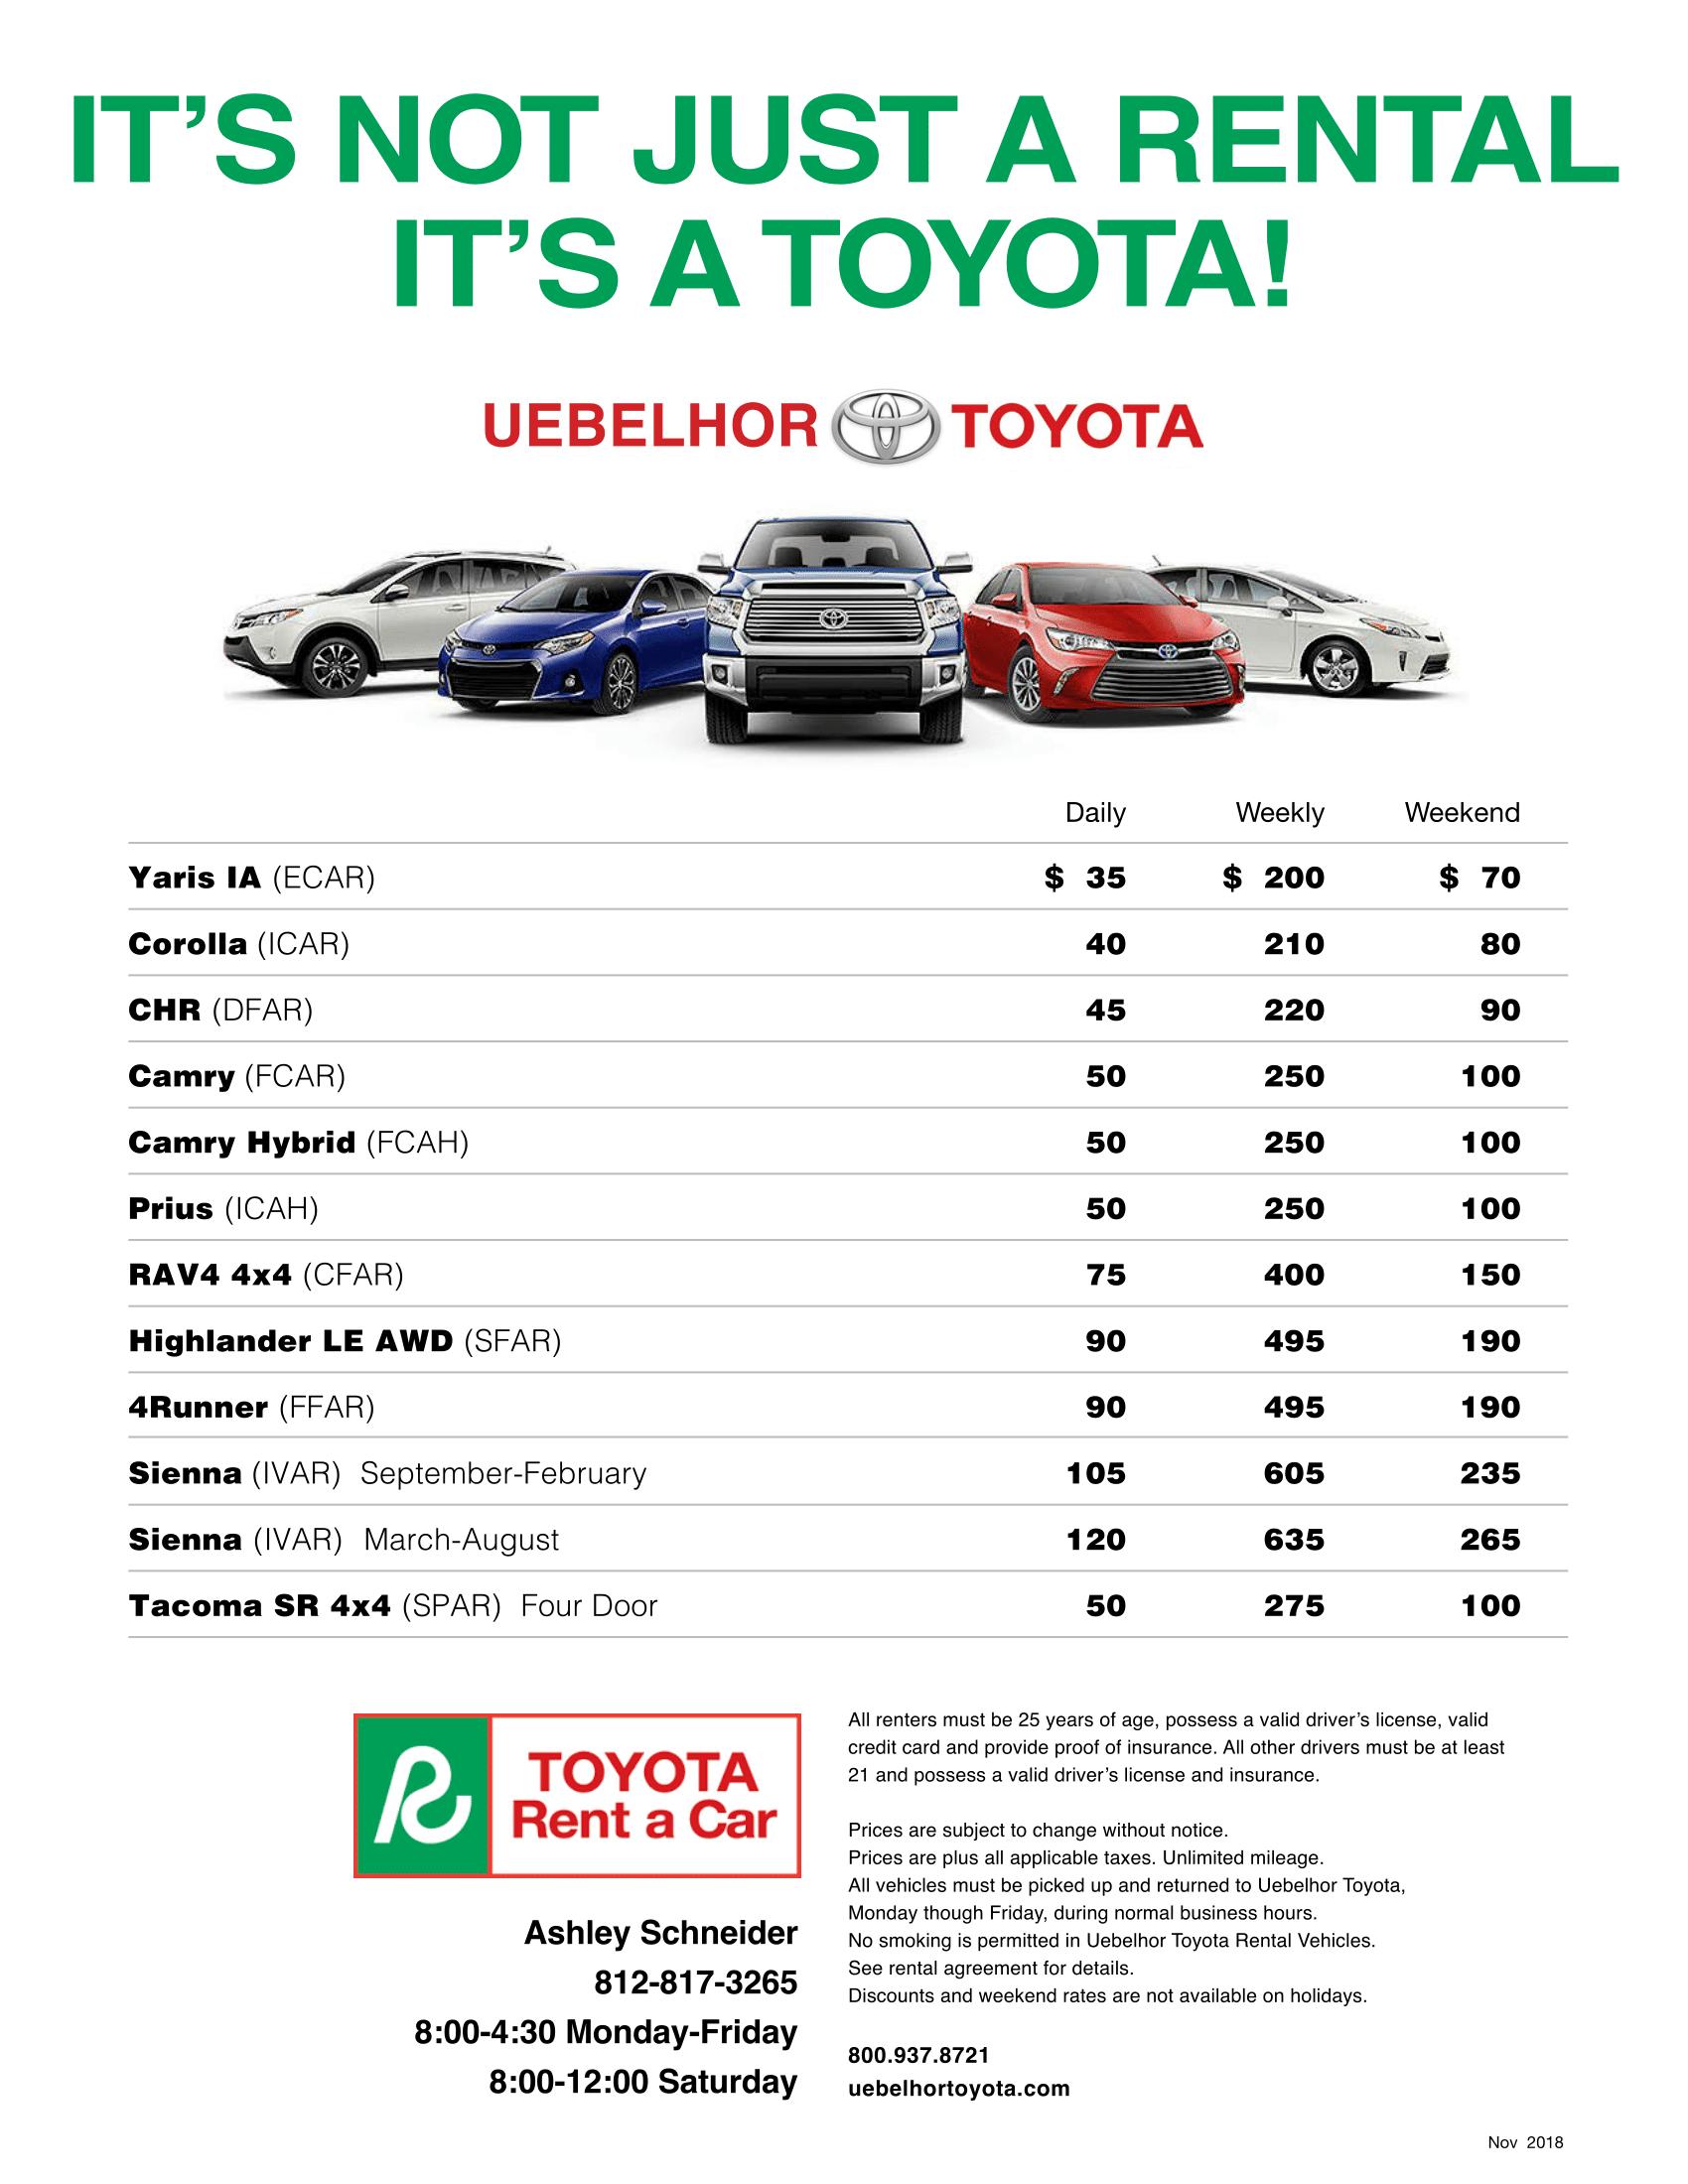 Rent a Toyota from Uebelhor Toyota in Jasper, IN